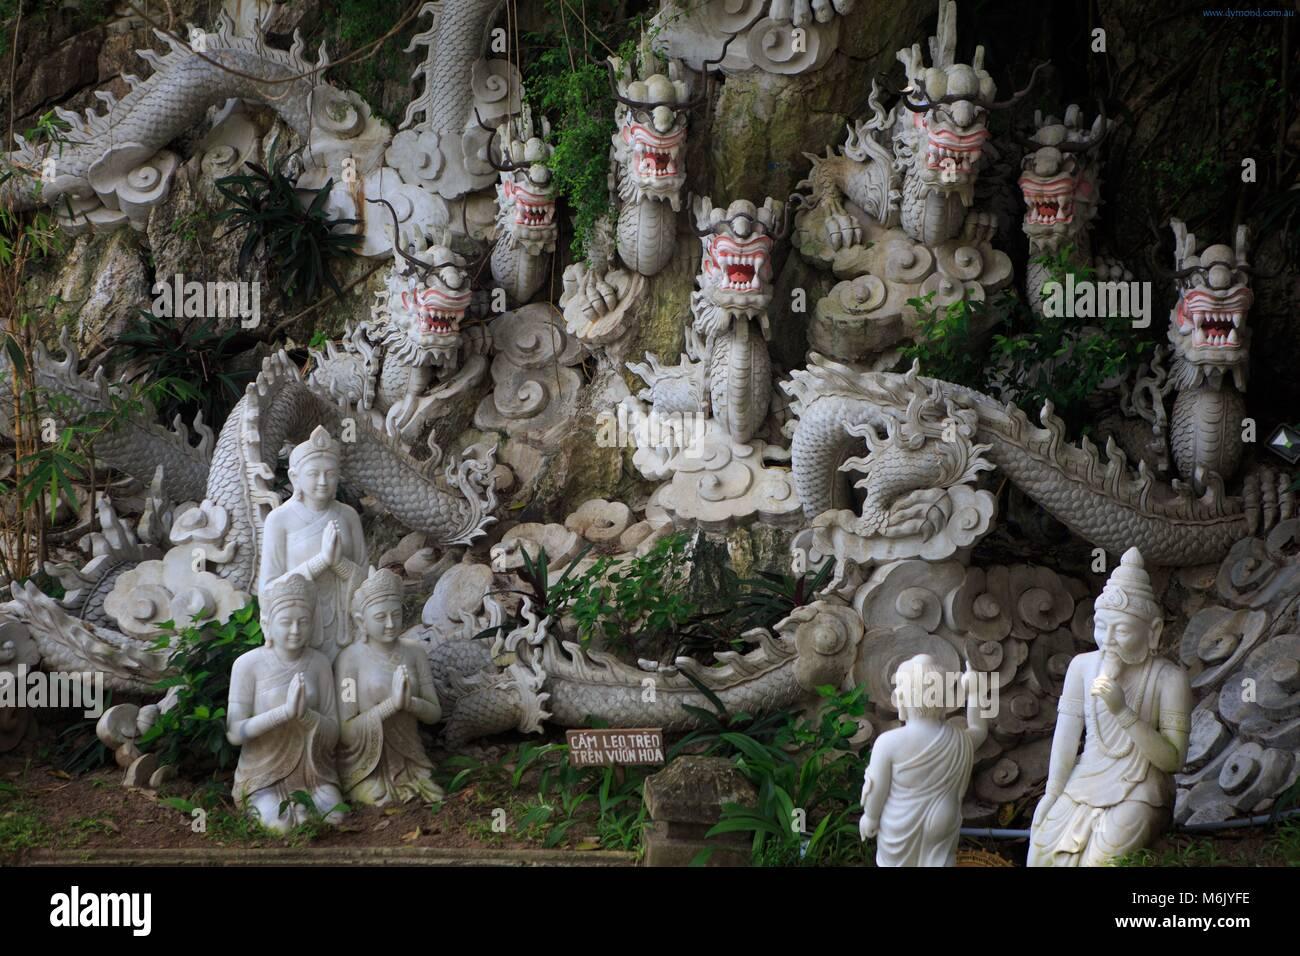 Statues in the gardens of Thuy Son Mountain, Da Nang, Vietnam - Stock Image